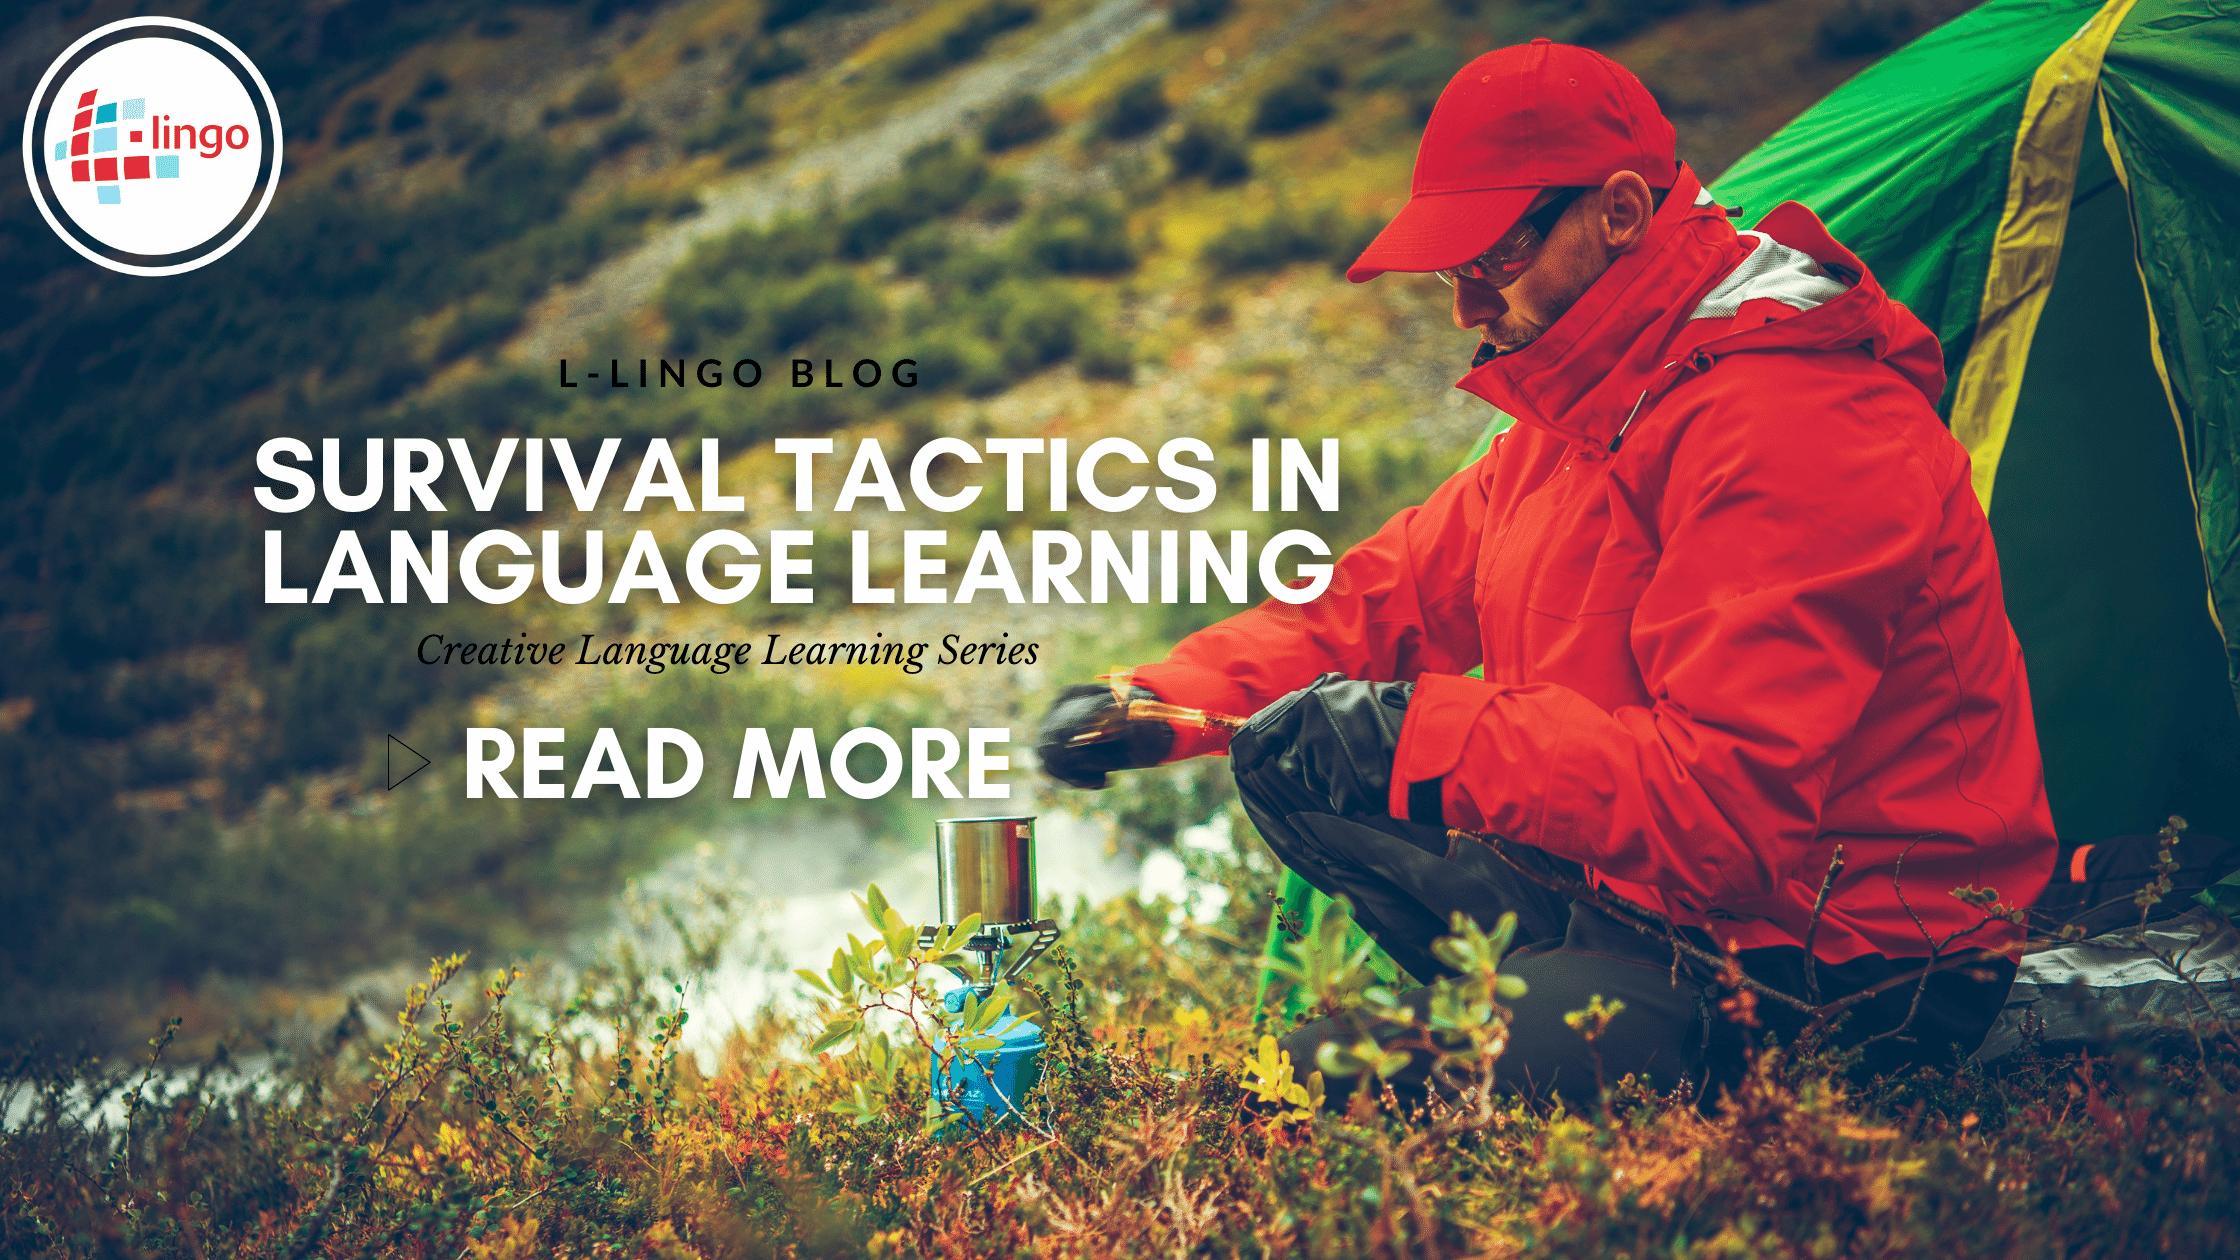 L-Lingo Blog SURVIVAL TACTICS IN LANGUAGE LEARNING